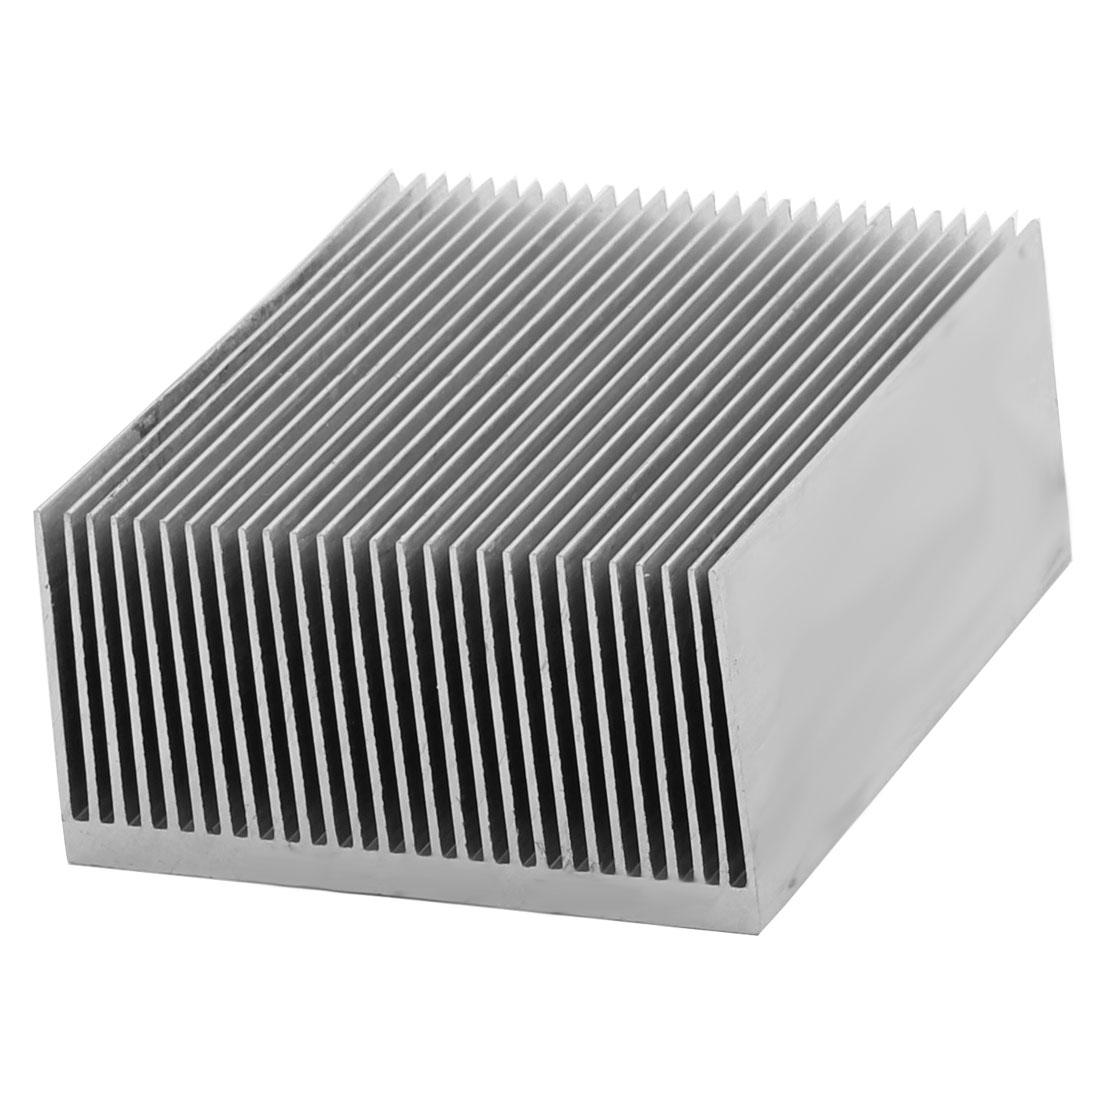 Aluminium Heatsink Heat Diffuse Dissipate Cooling Fin Silver Tone 80 x 69 x 36mm